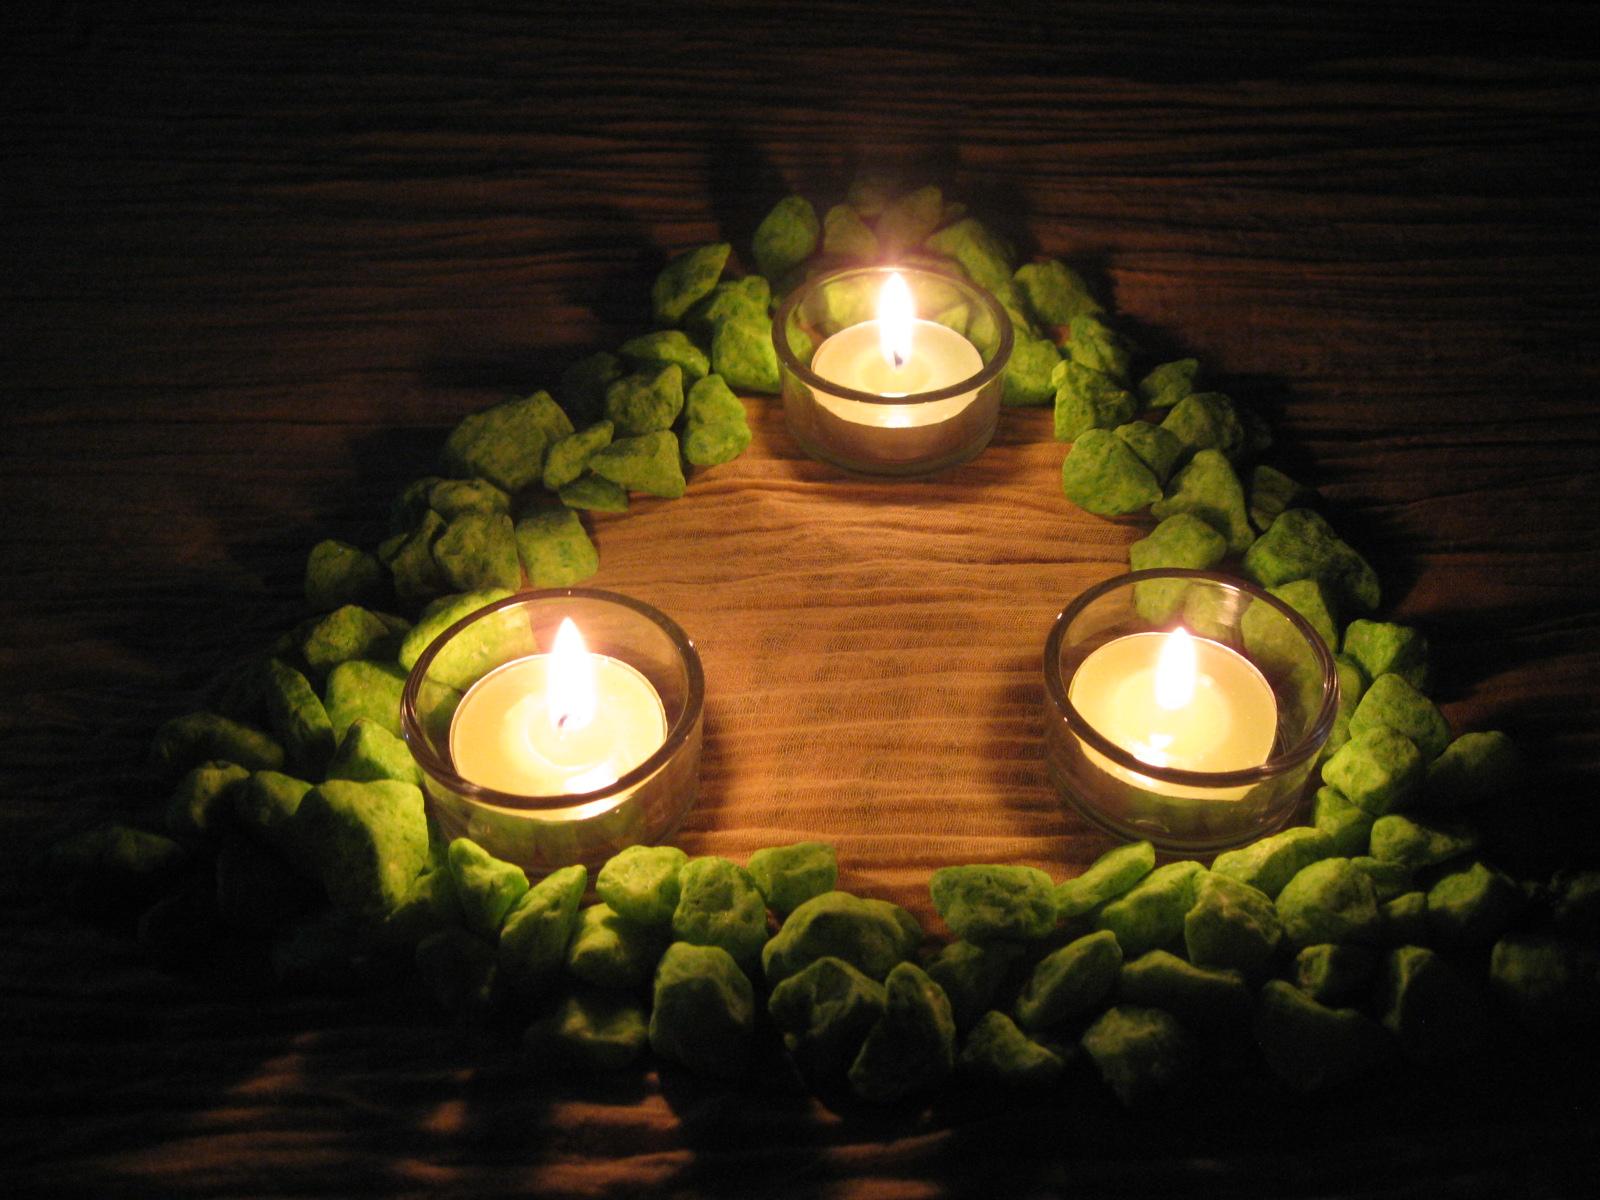 Encender velas como se usan las velas en la magia velas - Rituales para la buena suerte ...